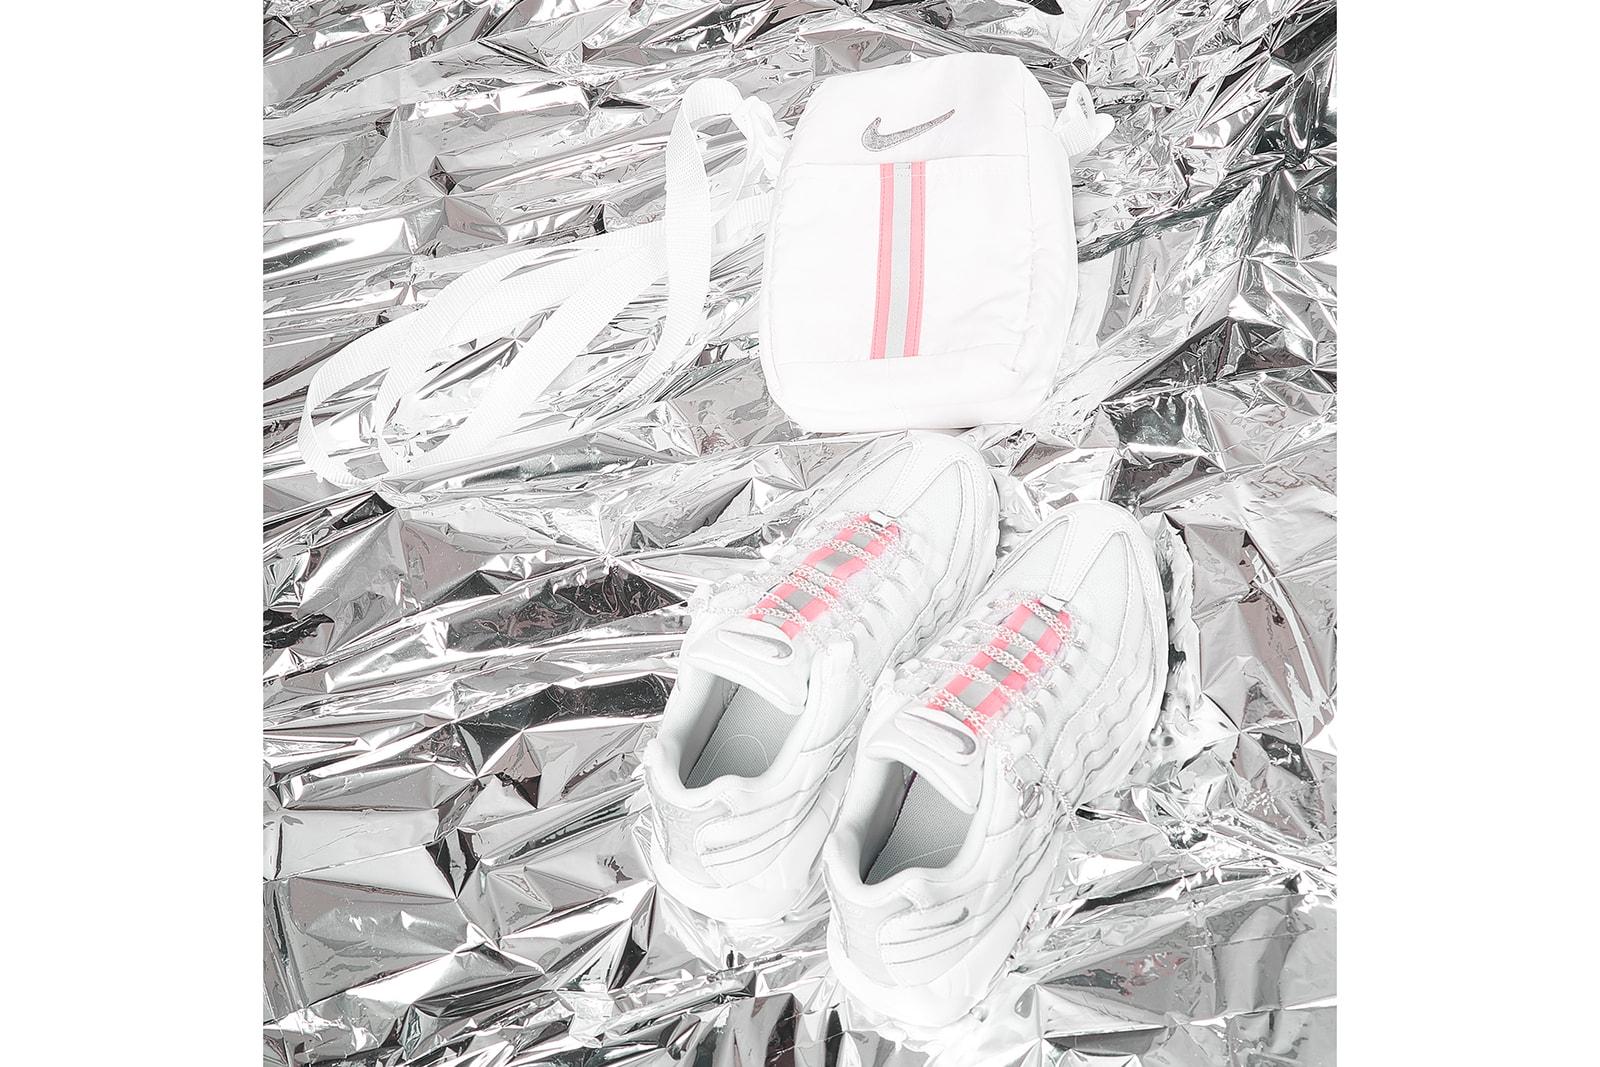 Nike Air Max Day 2018 Custom Sneakers Women DIY Customize Swarovski Crystals Frankie Collective Sara Gourlay Streetwear Art Design Mega McGrath Streetscript Stephanie Au Swimmer Sophia Wilson Elizabeth De La Piedra 95 90 270